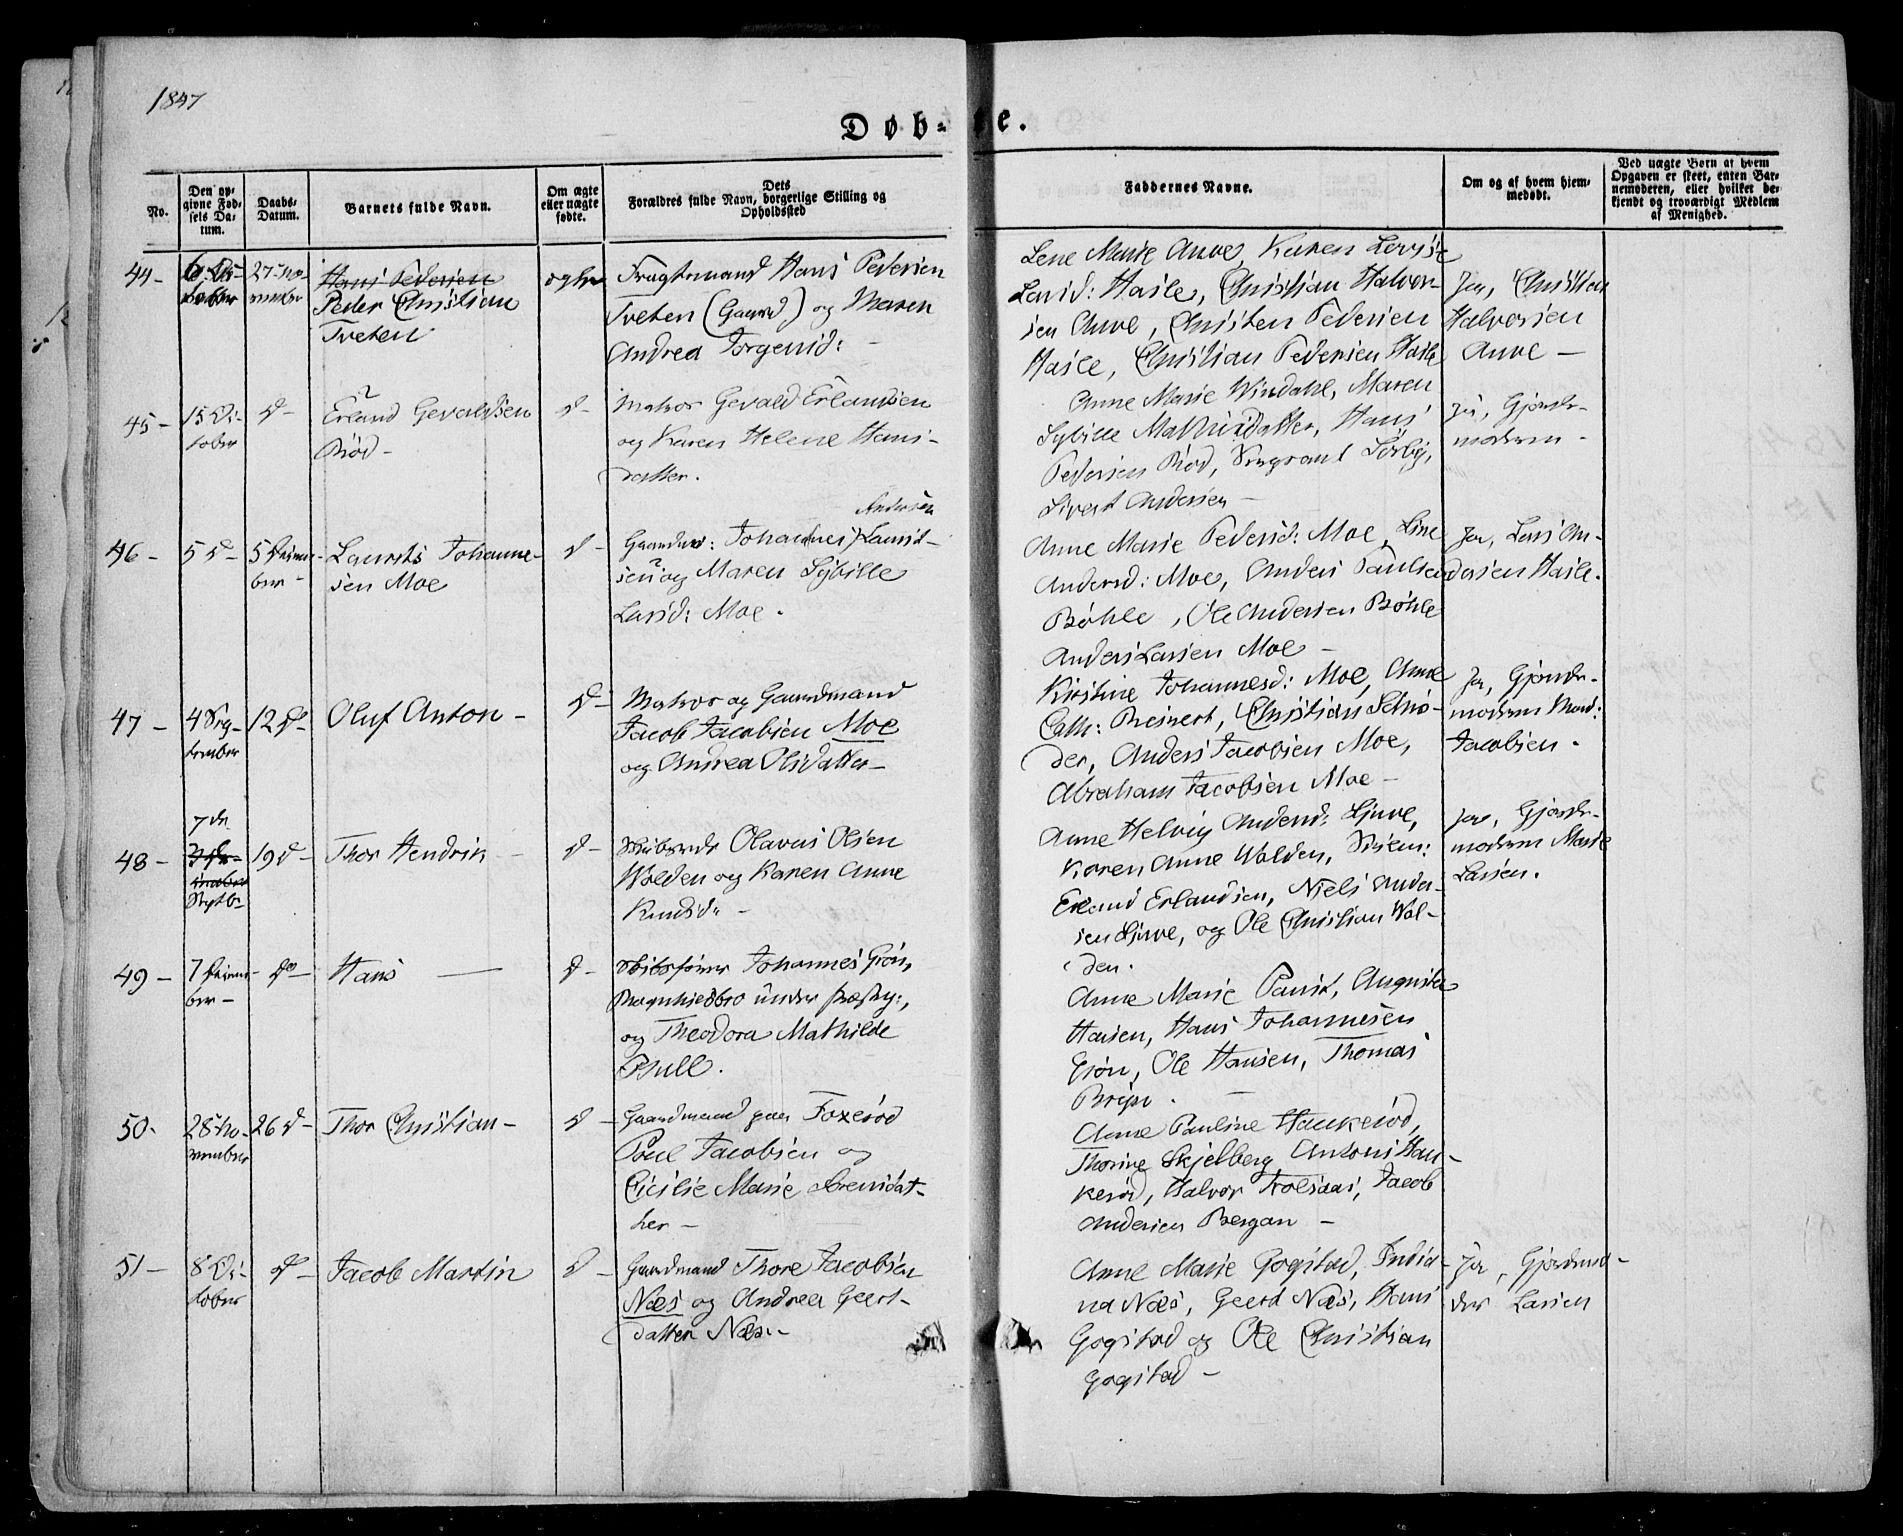 SAKO, Sandar kirkebøker, F/Fa/L0006: Ministerialbok nr. 6, 1847-1860, s. 5b